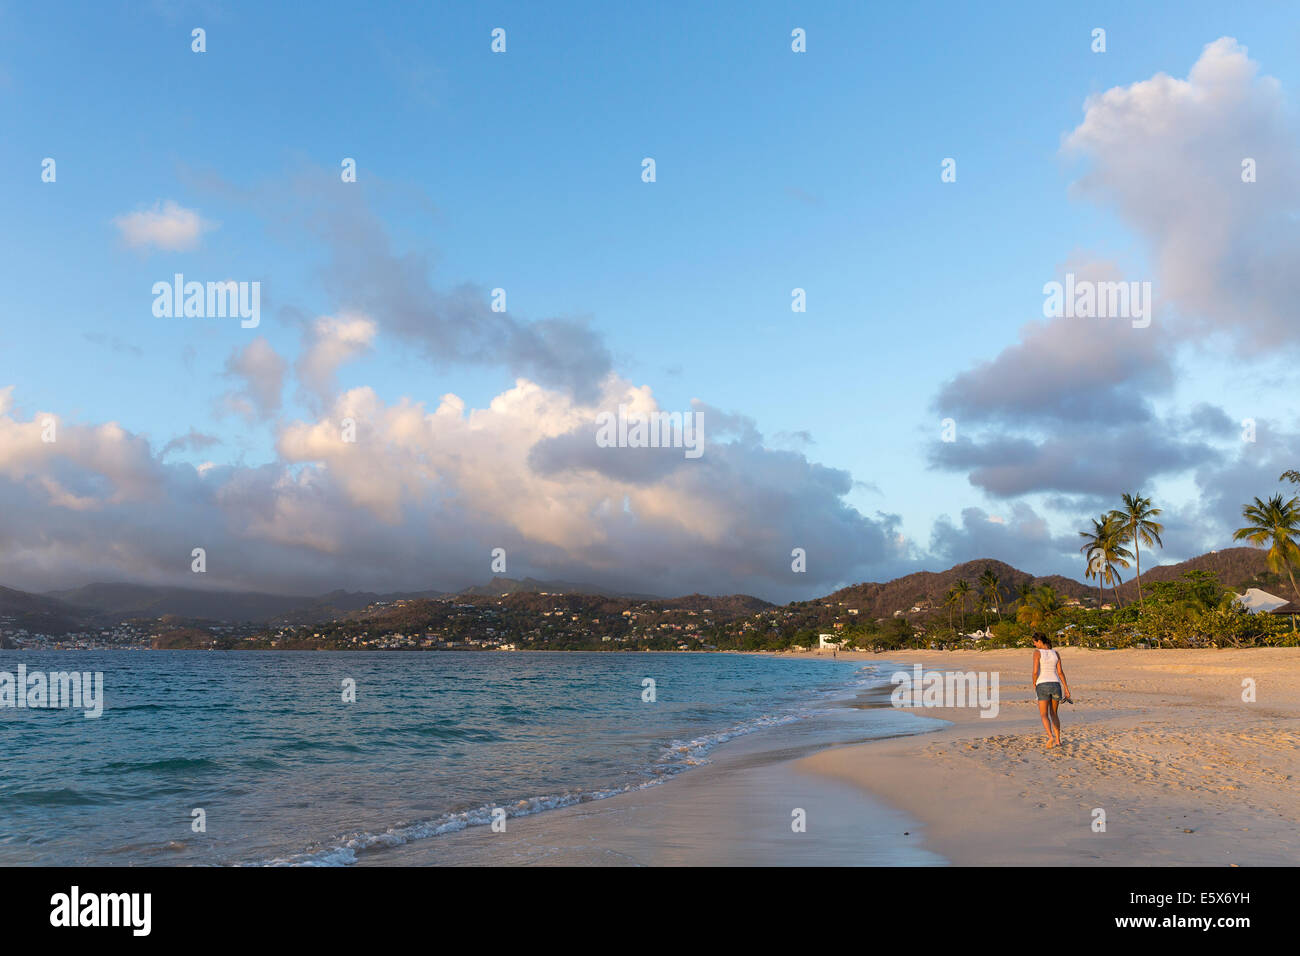 Rear view of mid adult woman strolling on beach, Spice Island beach resort, Grenada, Caribbean Stock Photo